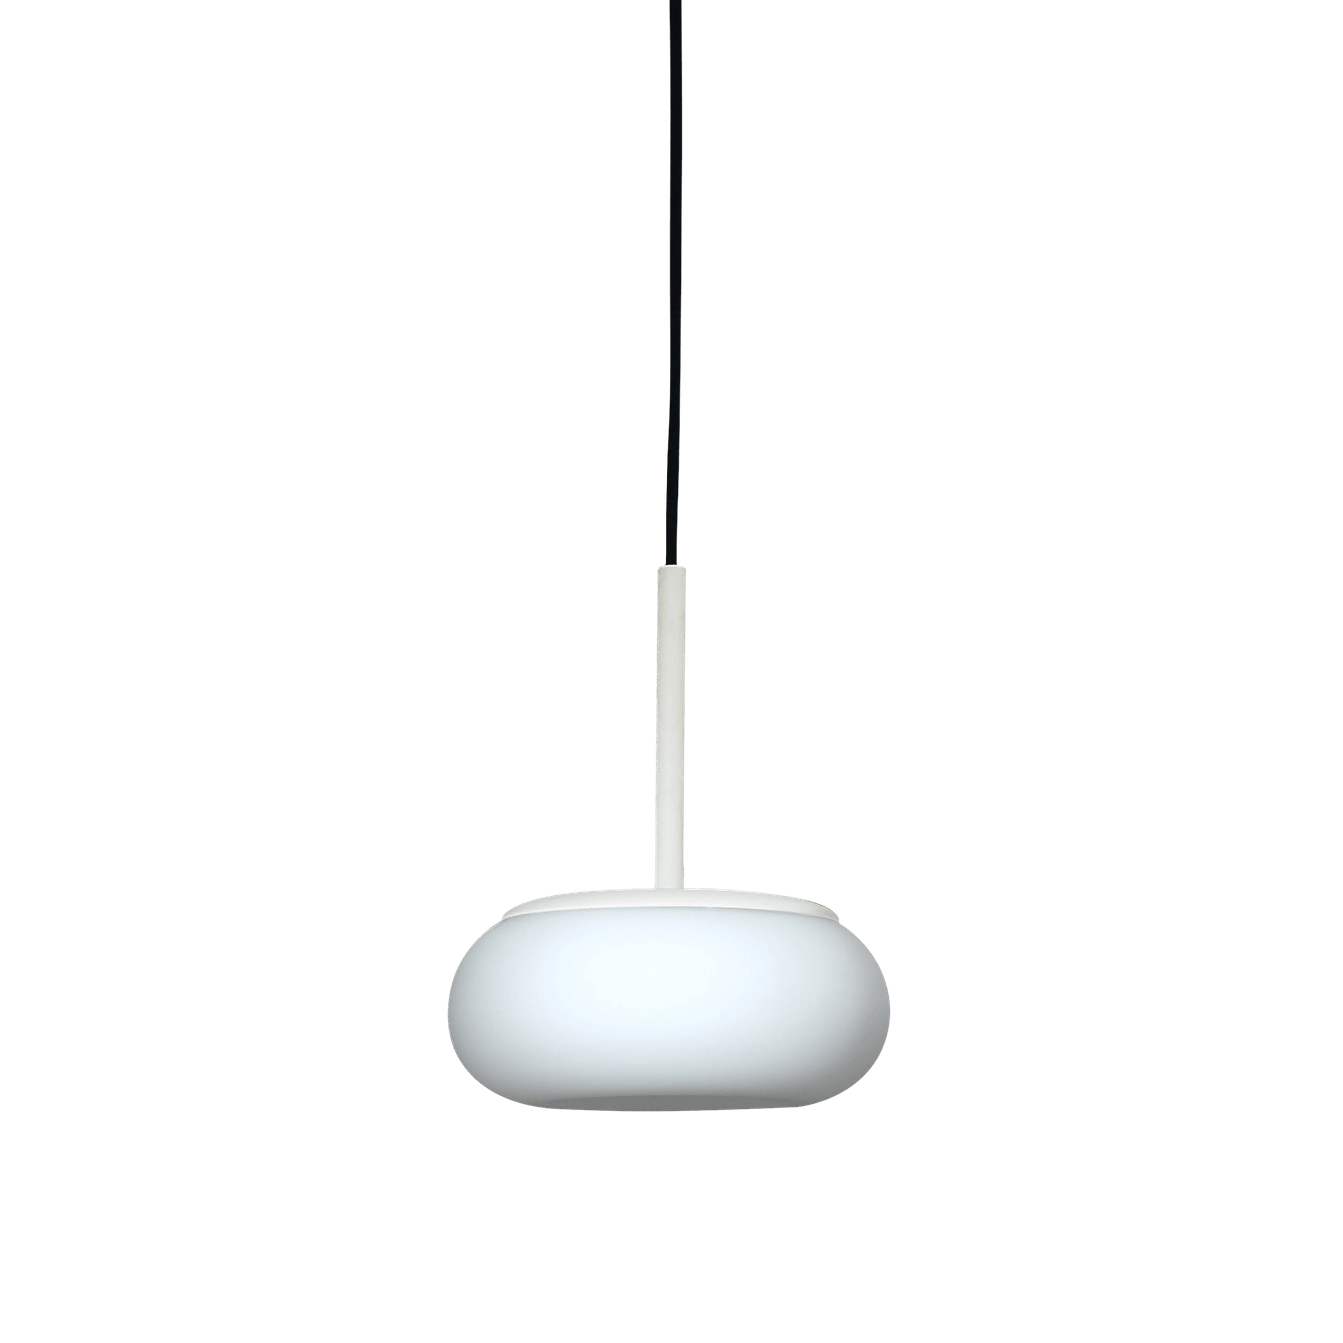 Ago lighting small mozzi pendant cream haute living